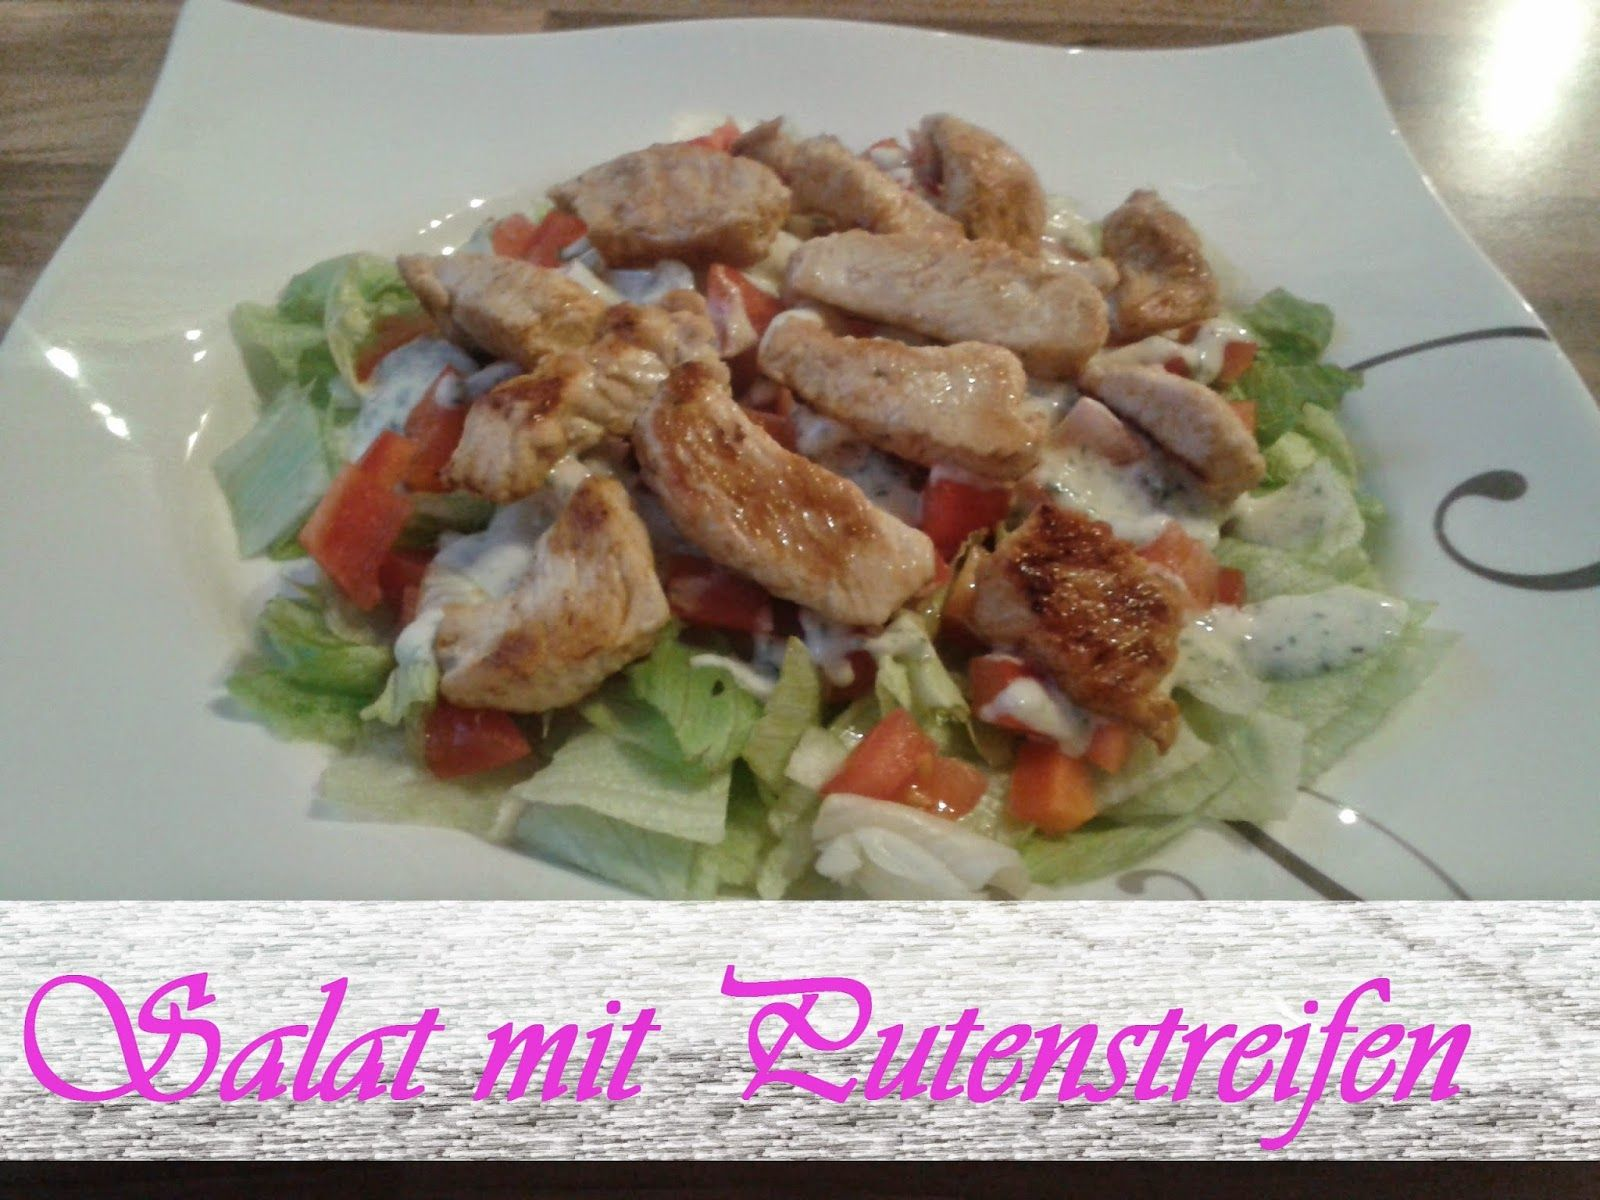 Jeannette's Low Carb Rezepte: Salat mit Putenstreifen